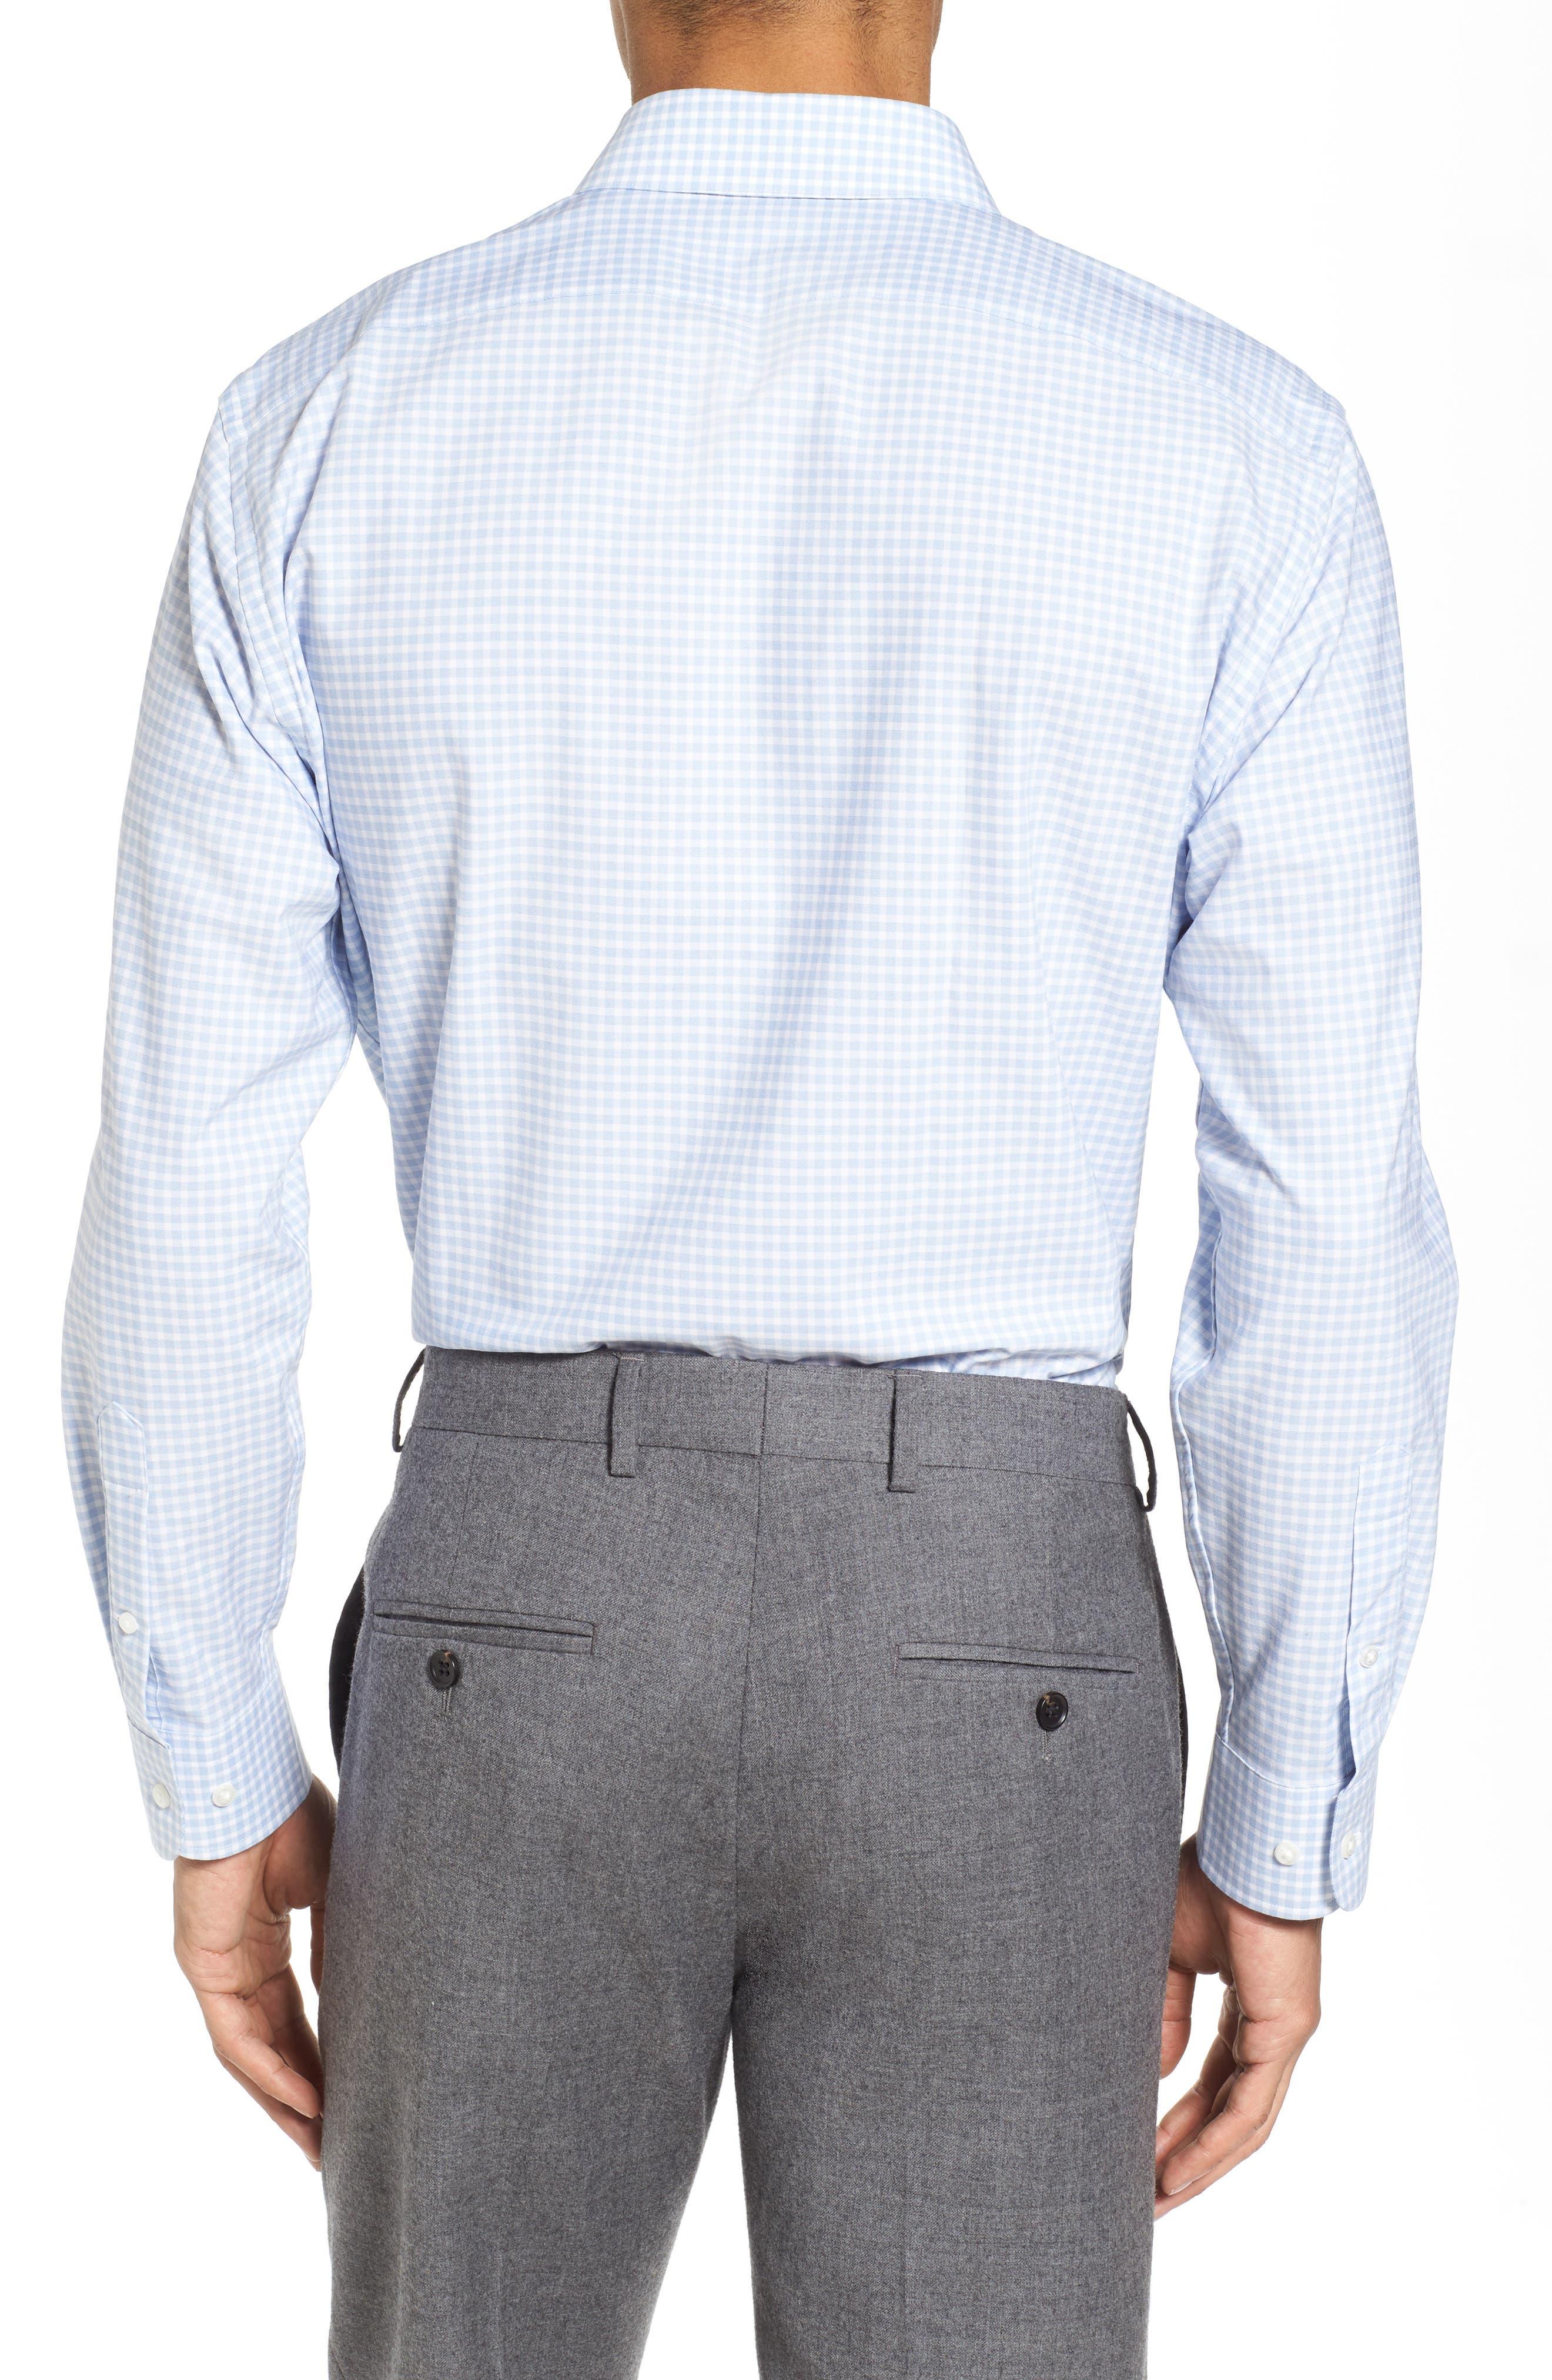 Tech-Smart Trim Fit Stretch Check Dress Shirt,                             Alternate thumbnail 2, color,                             420